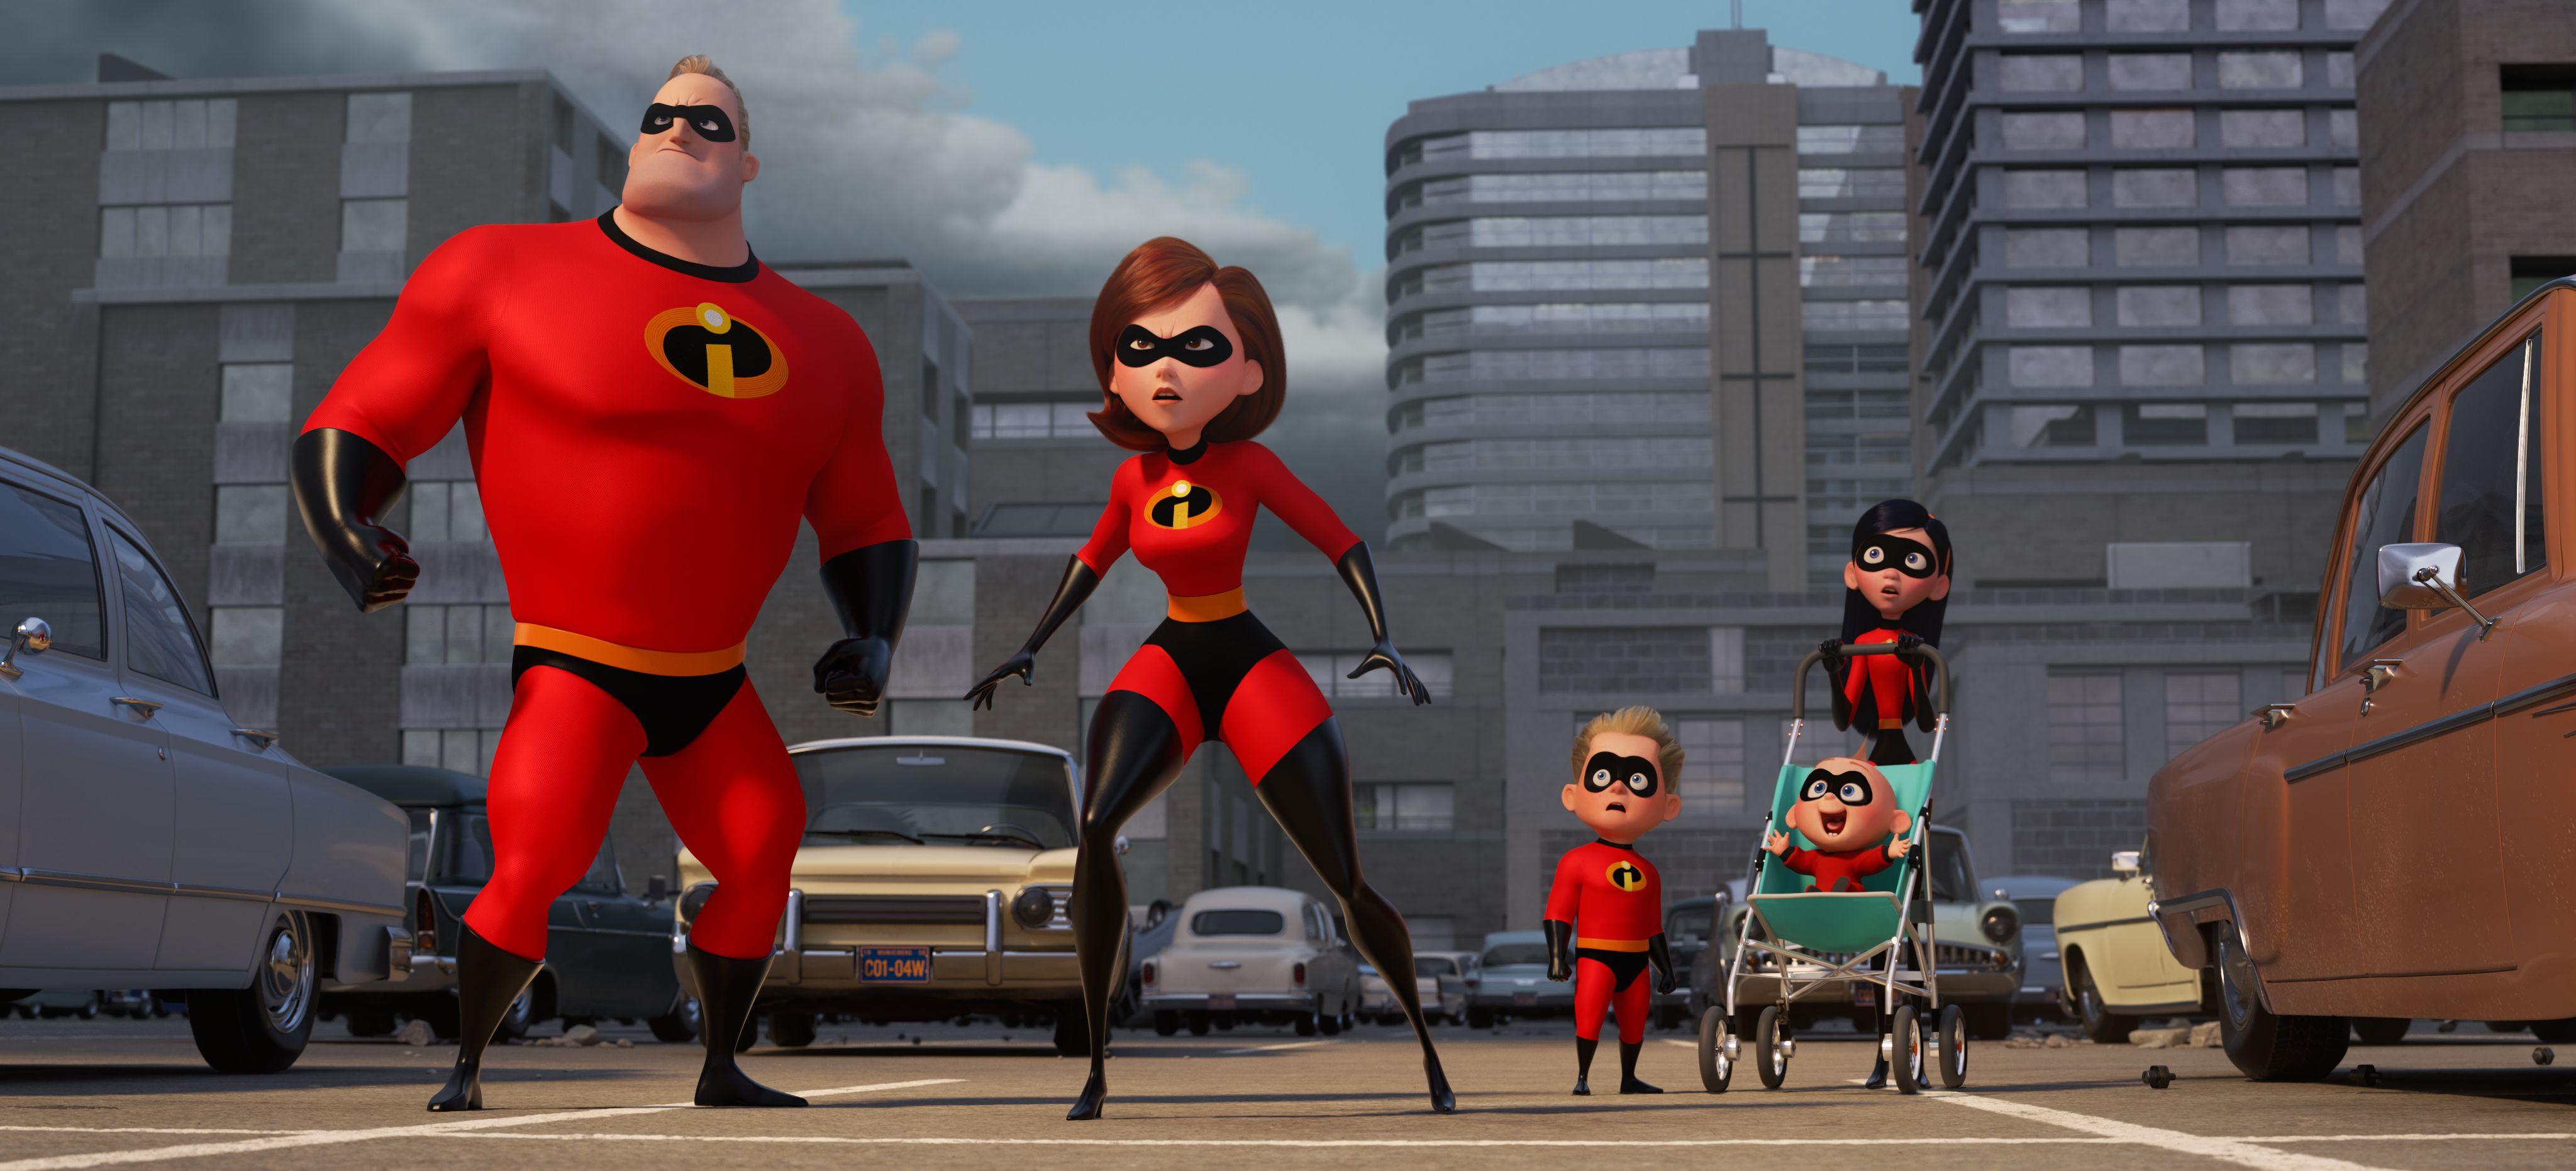 incredibles 2 - 'Incredibles 2' Trailer Brings Back Pixar's Powerful First Family